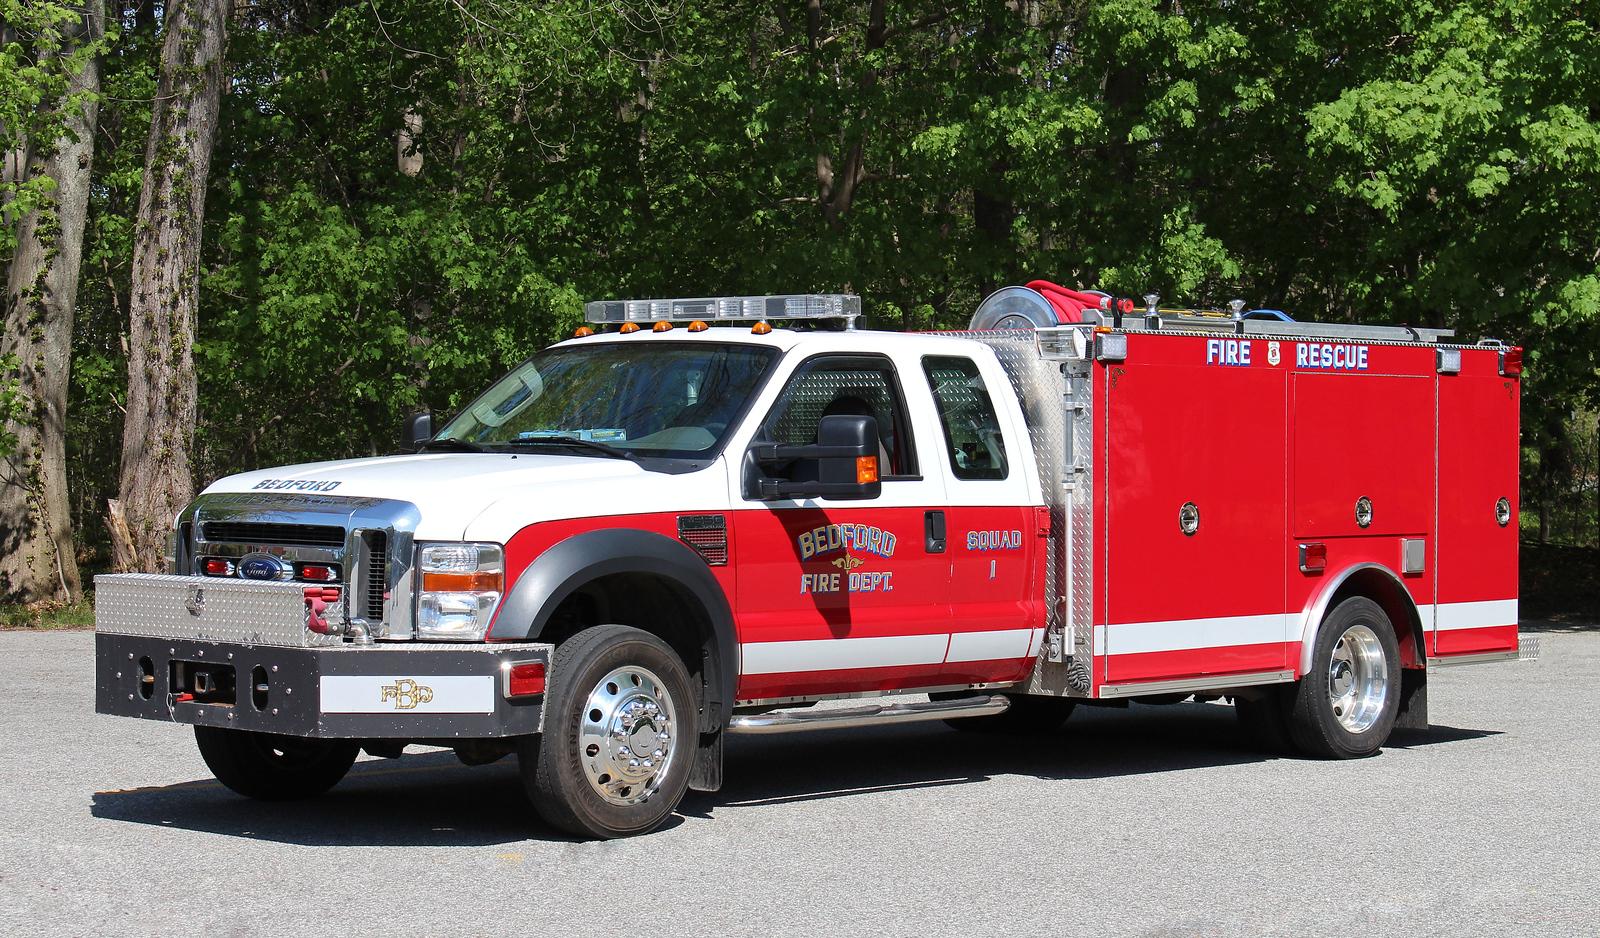 Squad 1 2010 Ford F-550 / Firematic 400 / 300